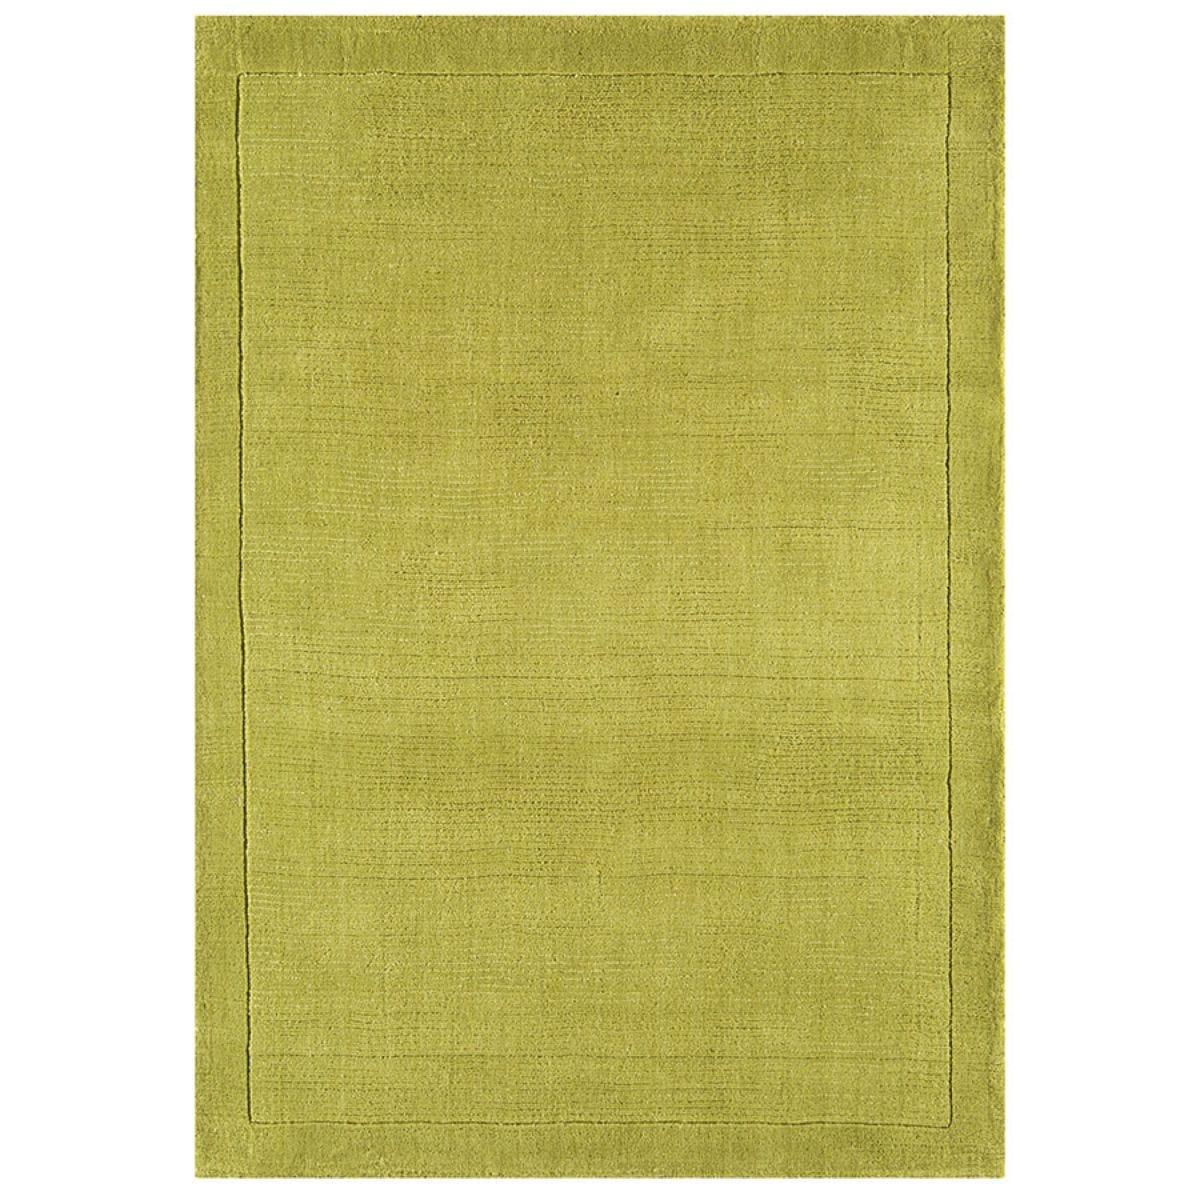 Asiatic York Handloom Rug, 80x150cm